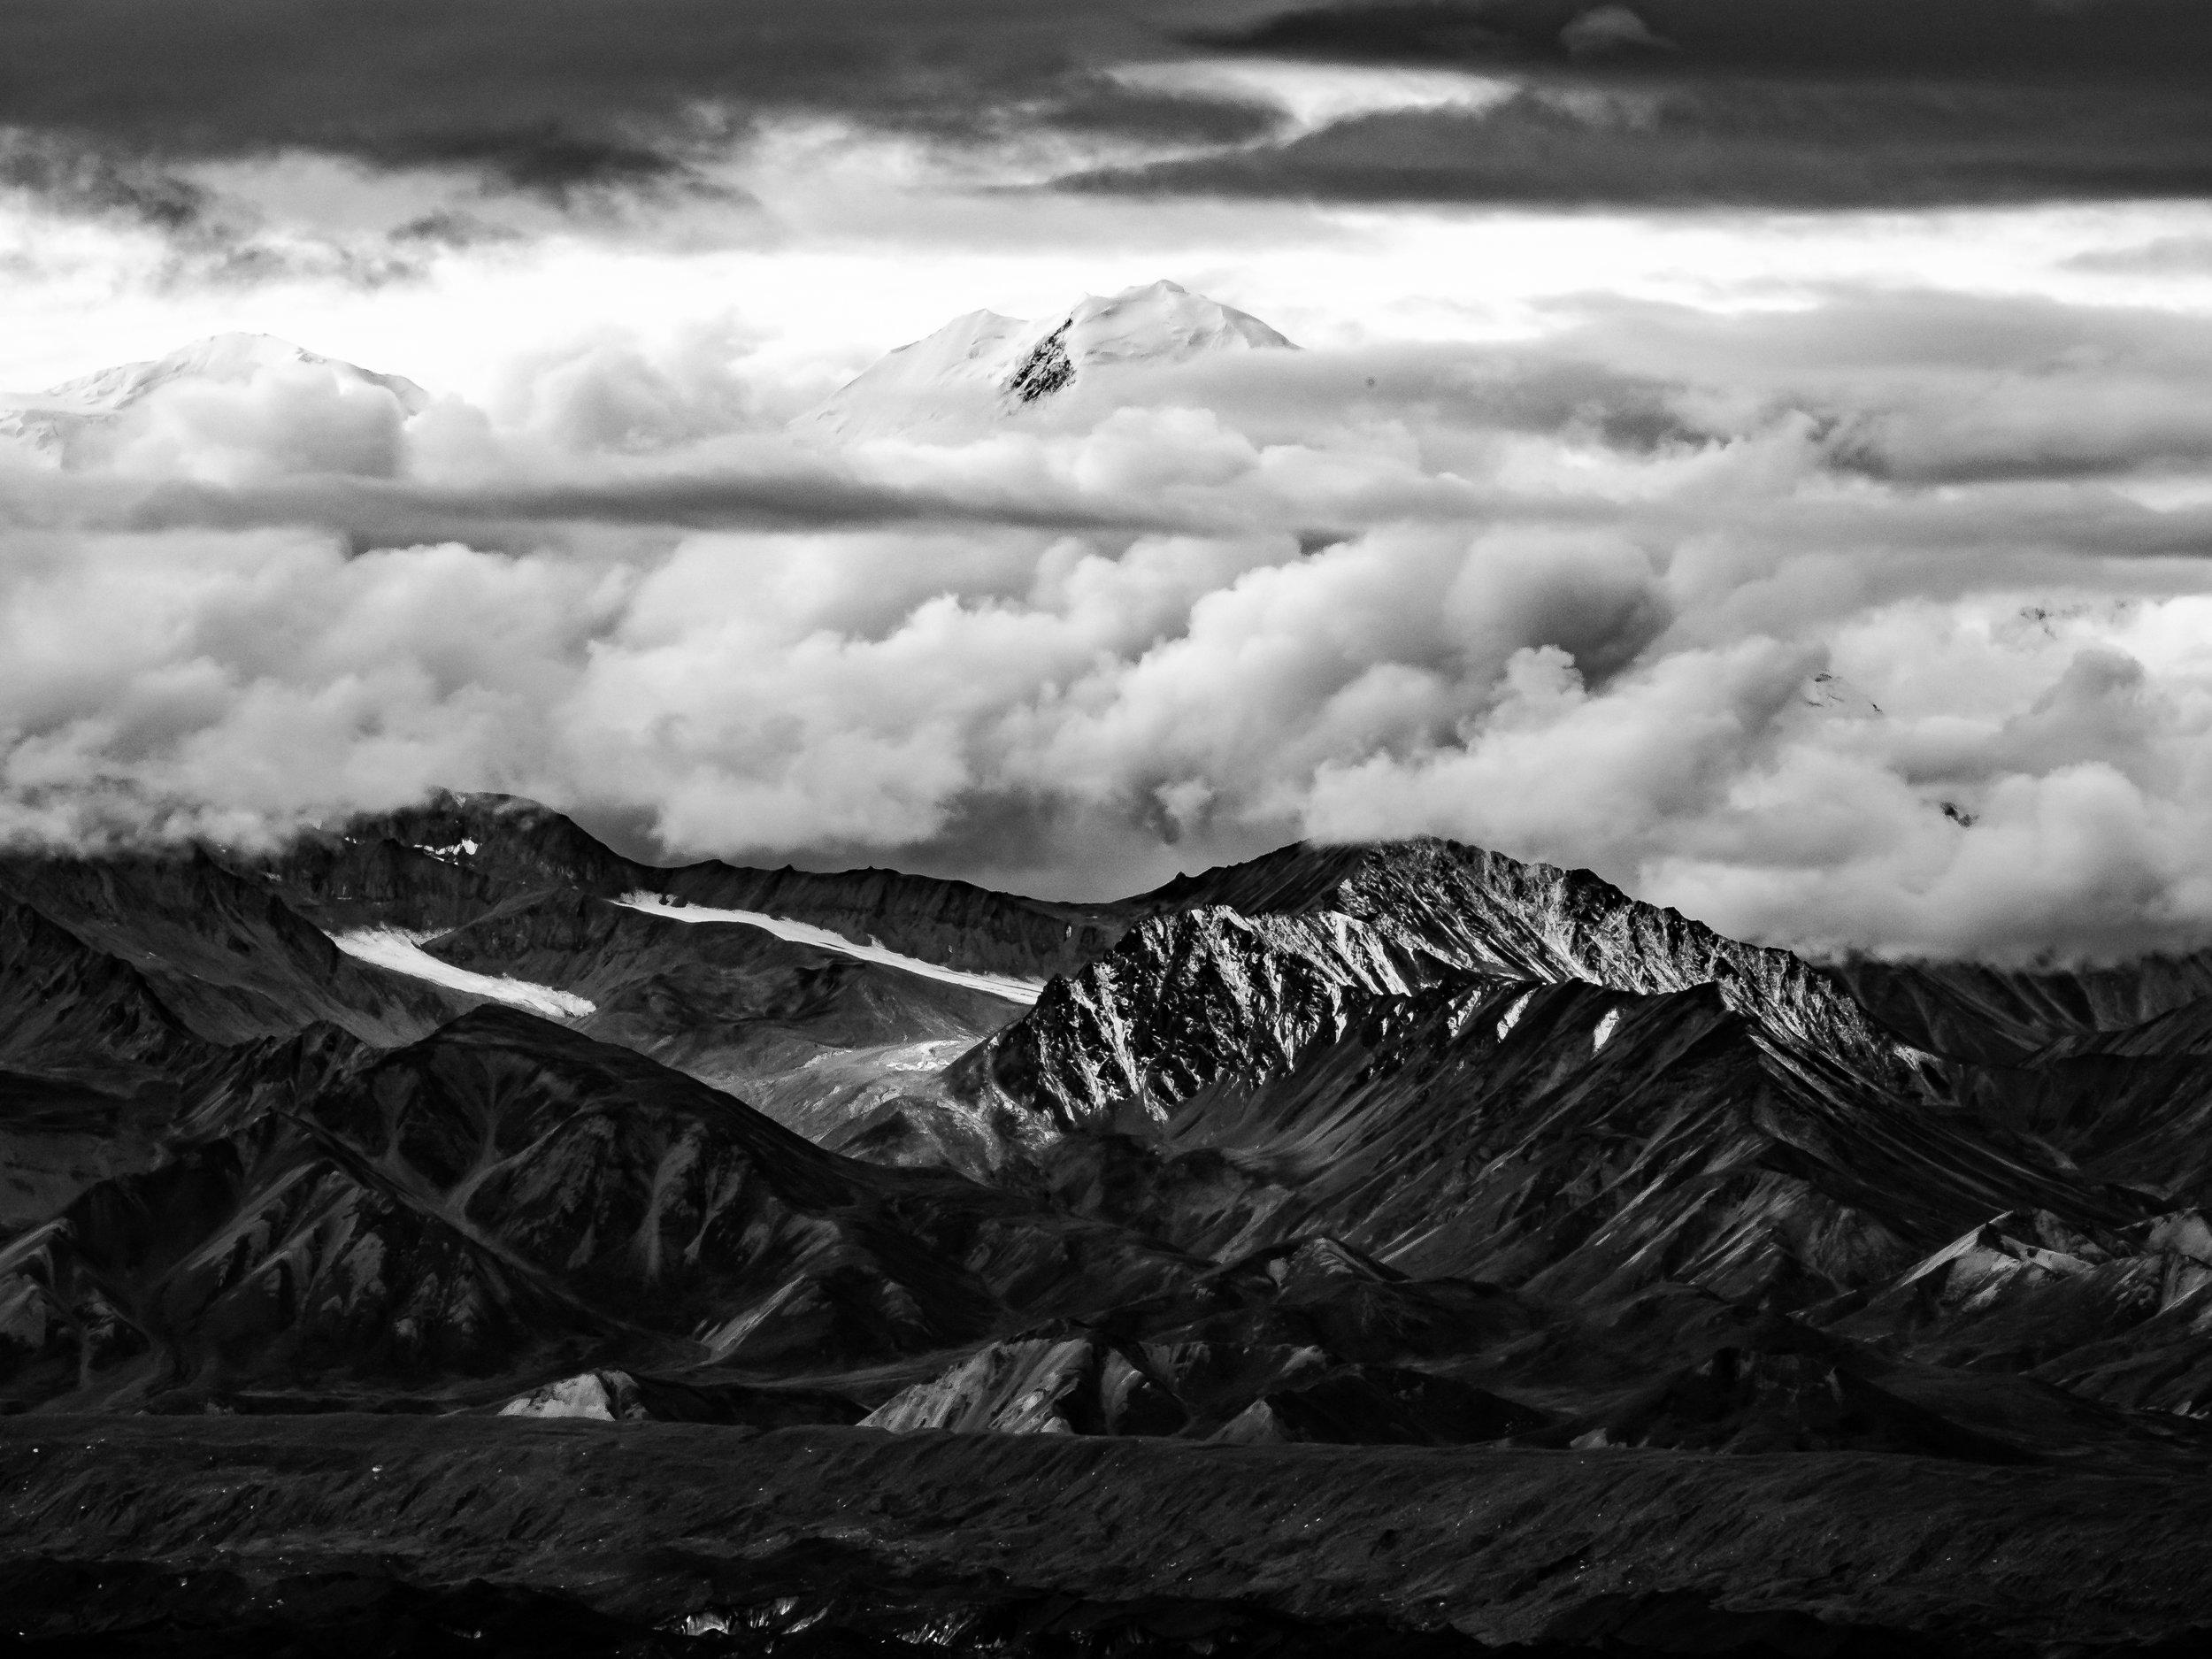 Denali's summit peeking above the clouds.